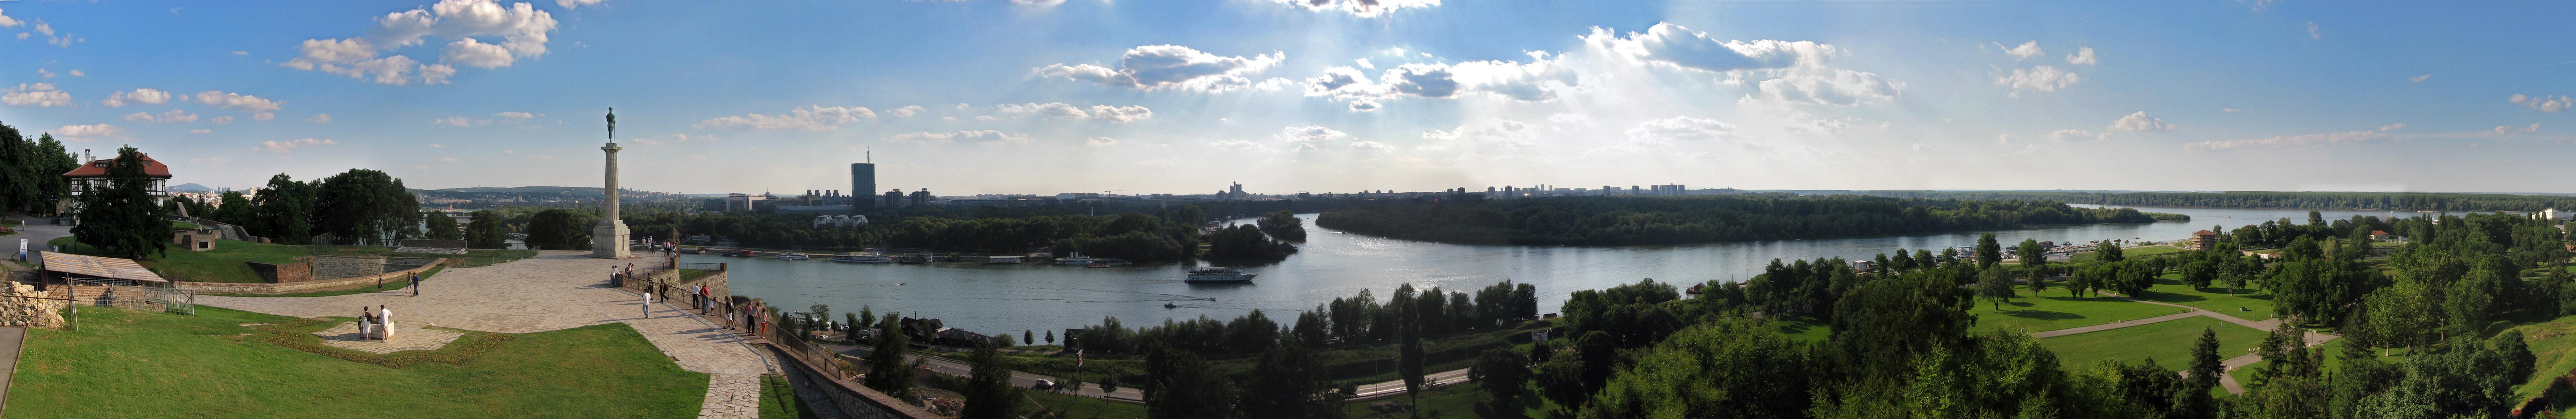 Belgrad, vedere panoramica